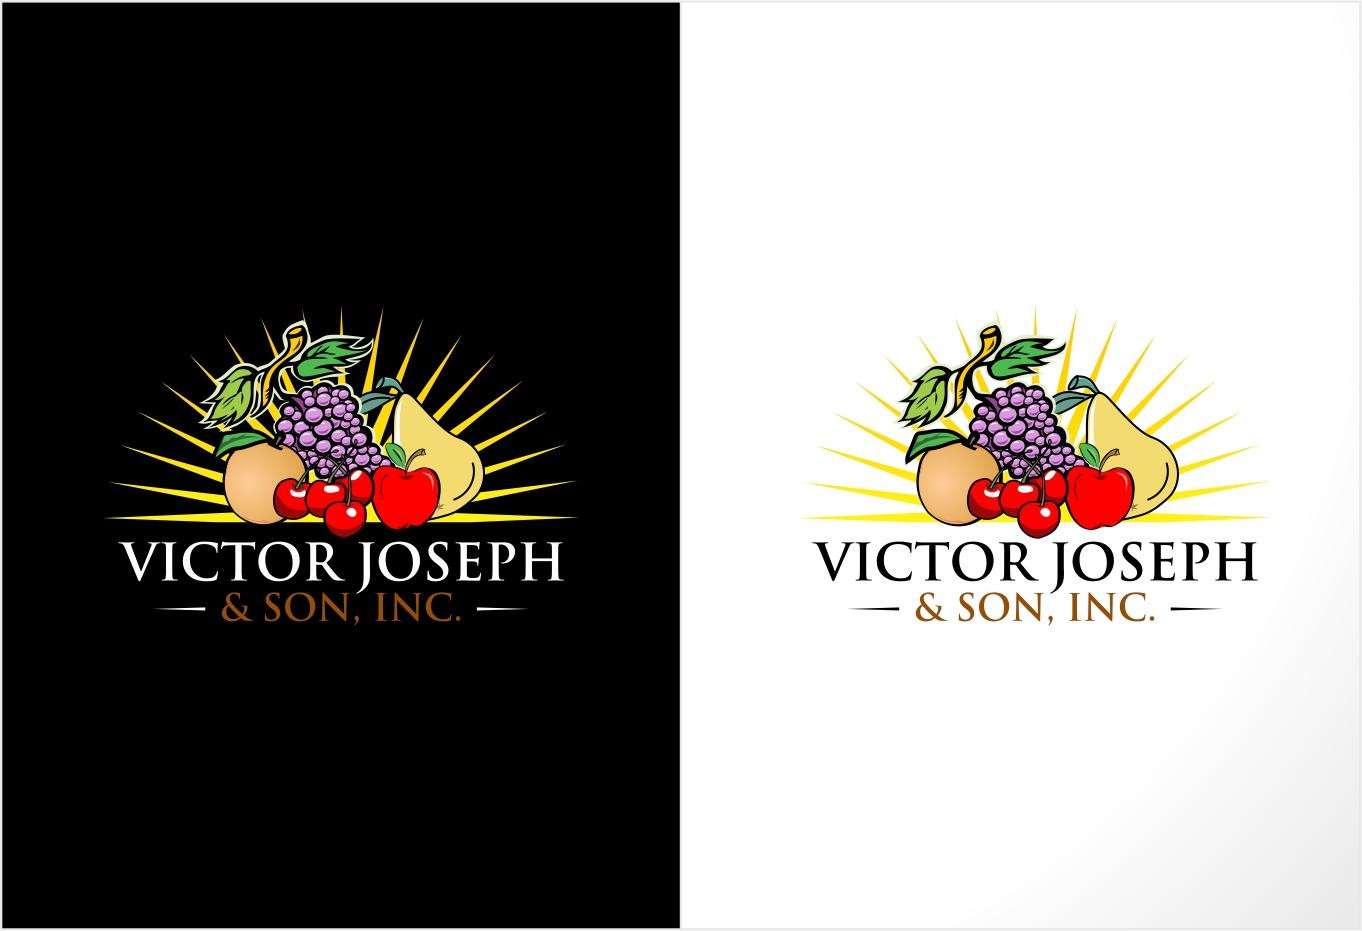 Logo Design by haidu - Entry No. 160 in the Logo Design Contest Imaginative Logo Design for Victor Joseph & Son, Inc..